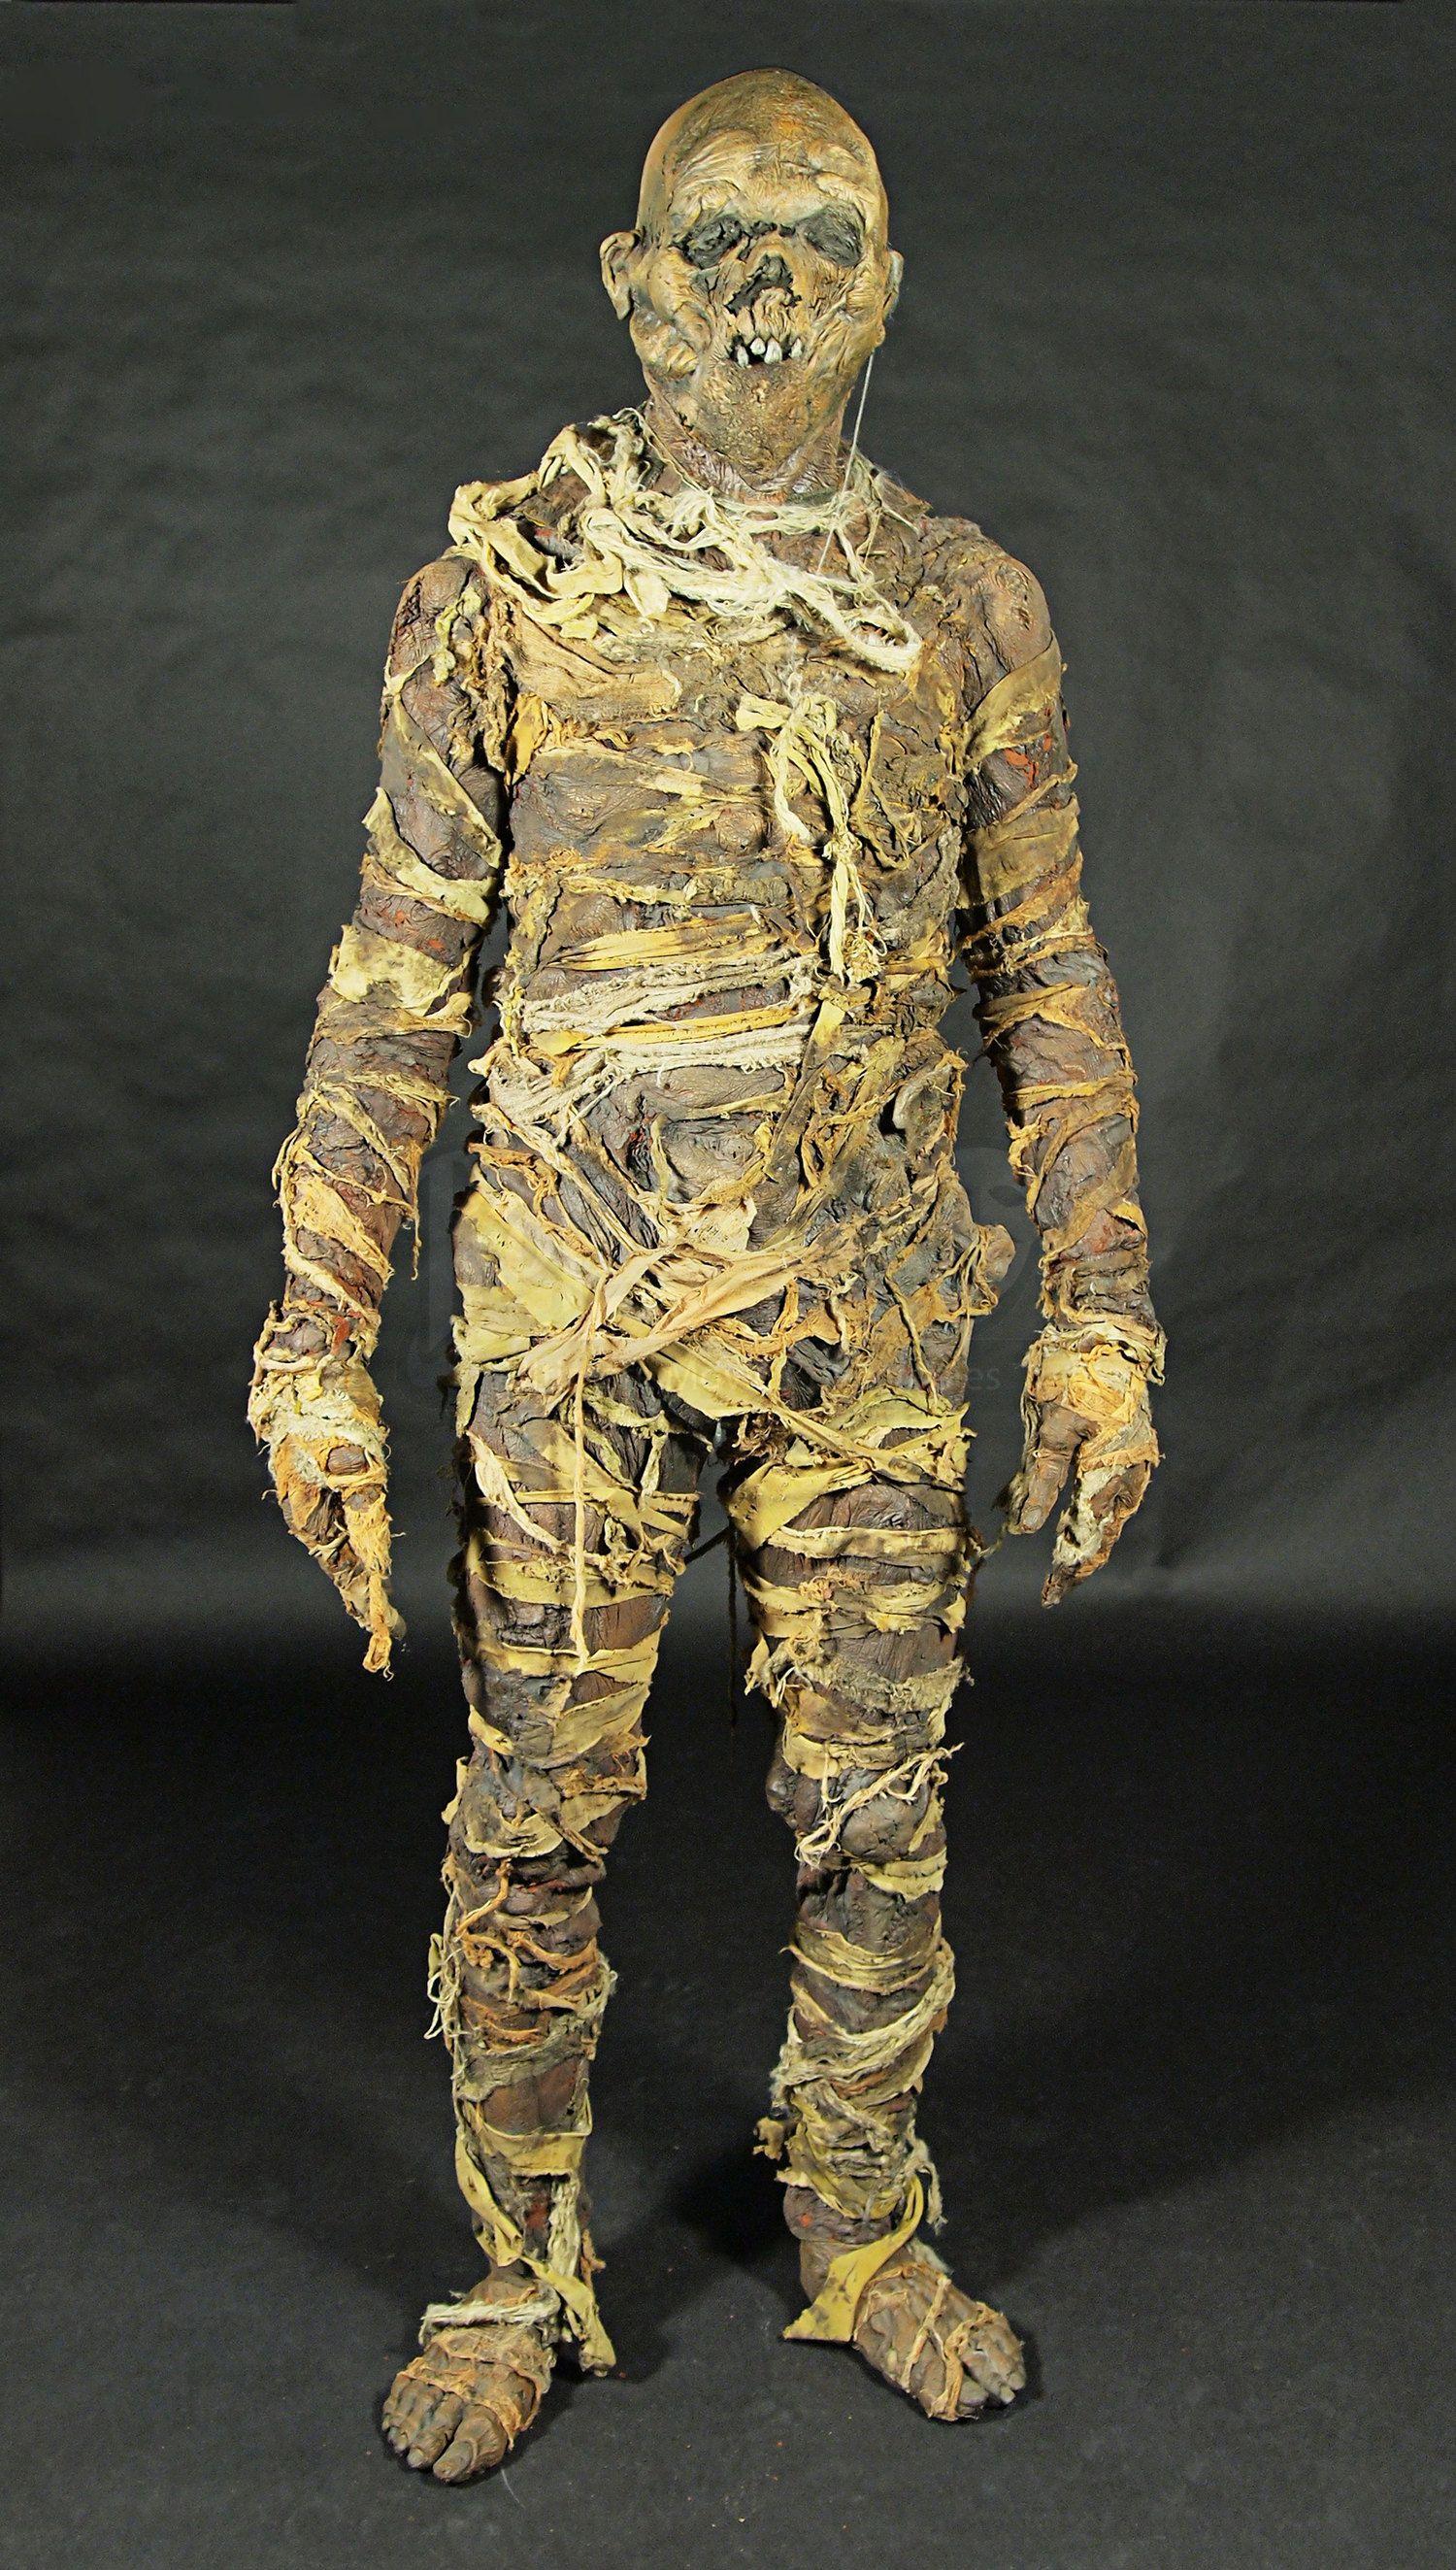 Scary Mummy Full Body Suit